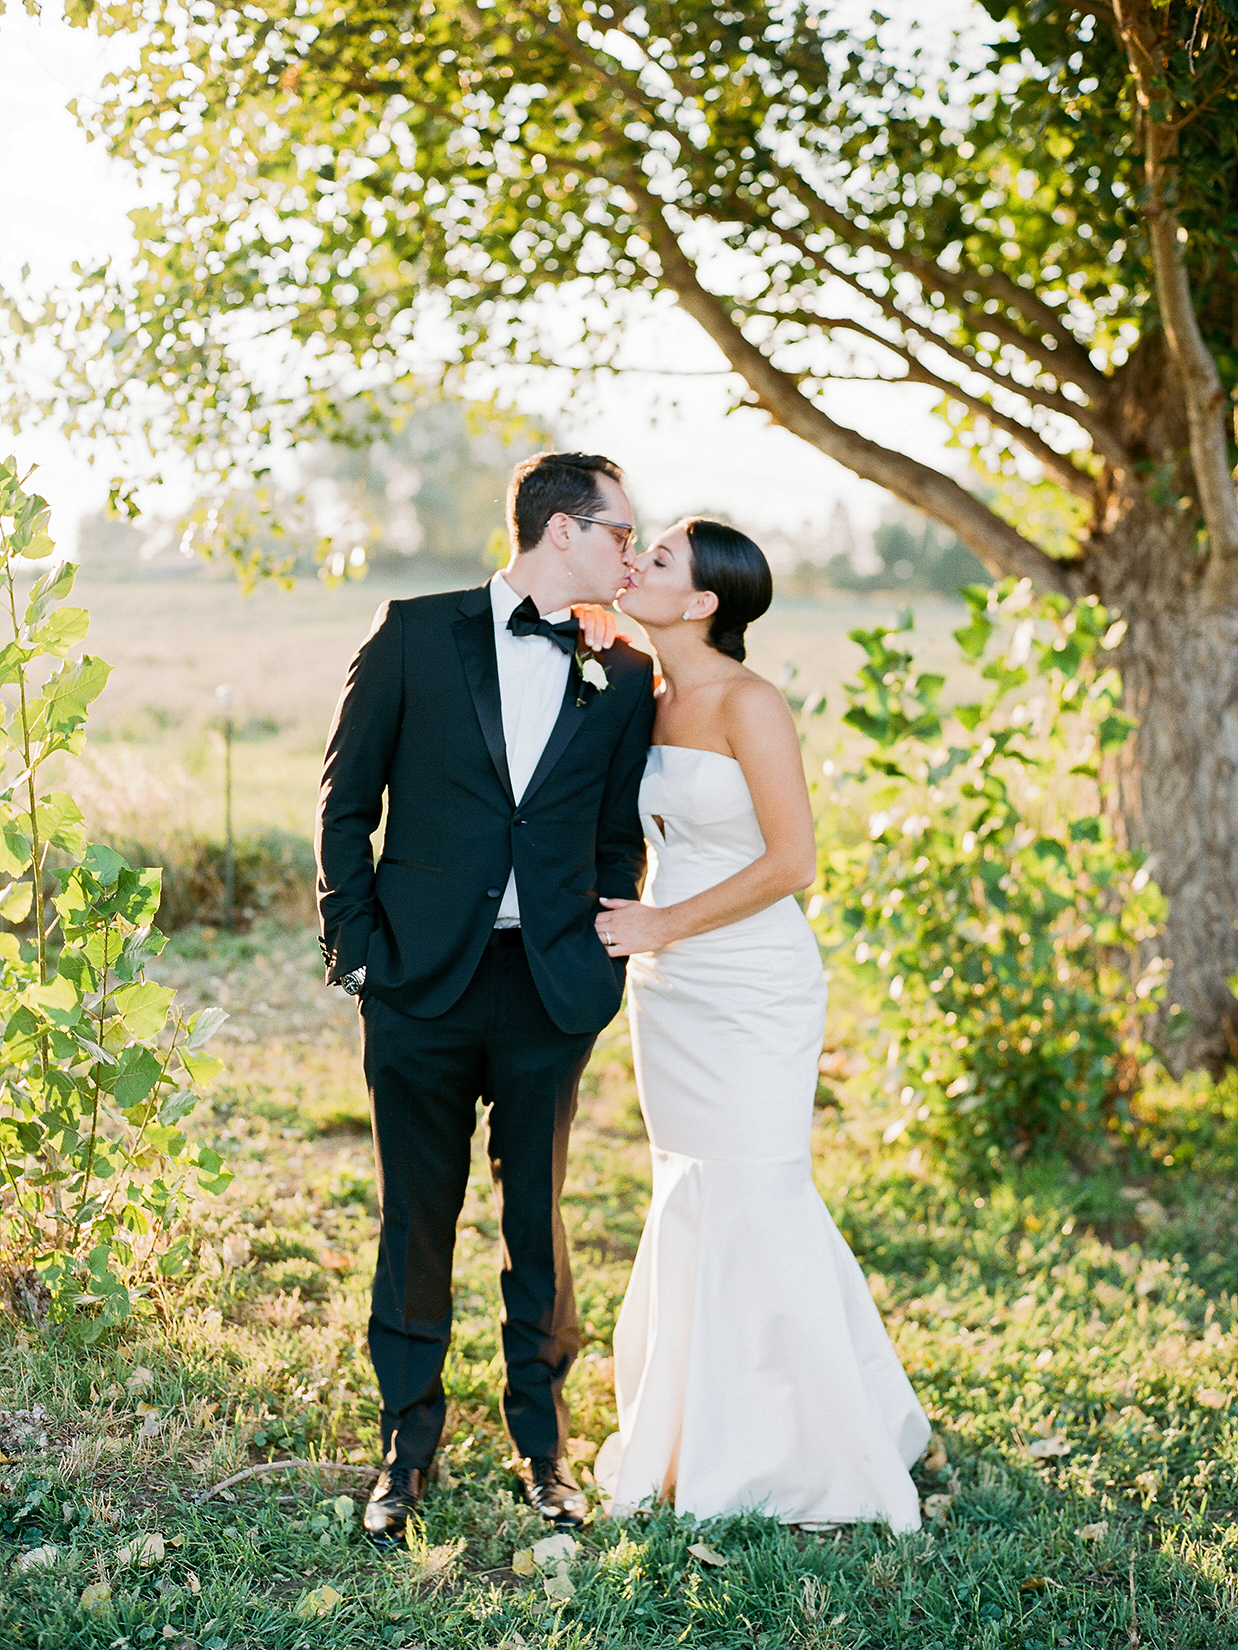 jamie jon wedding couple kiss